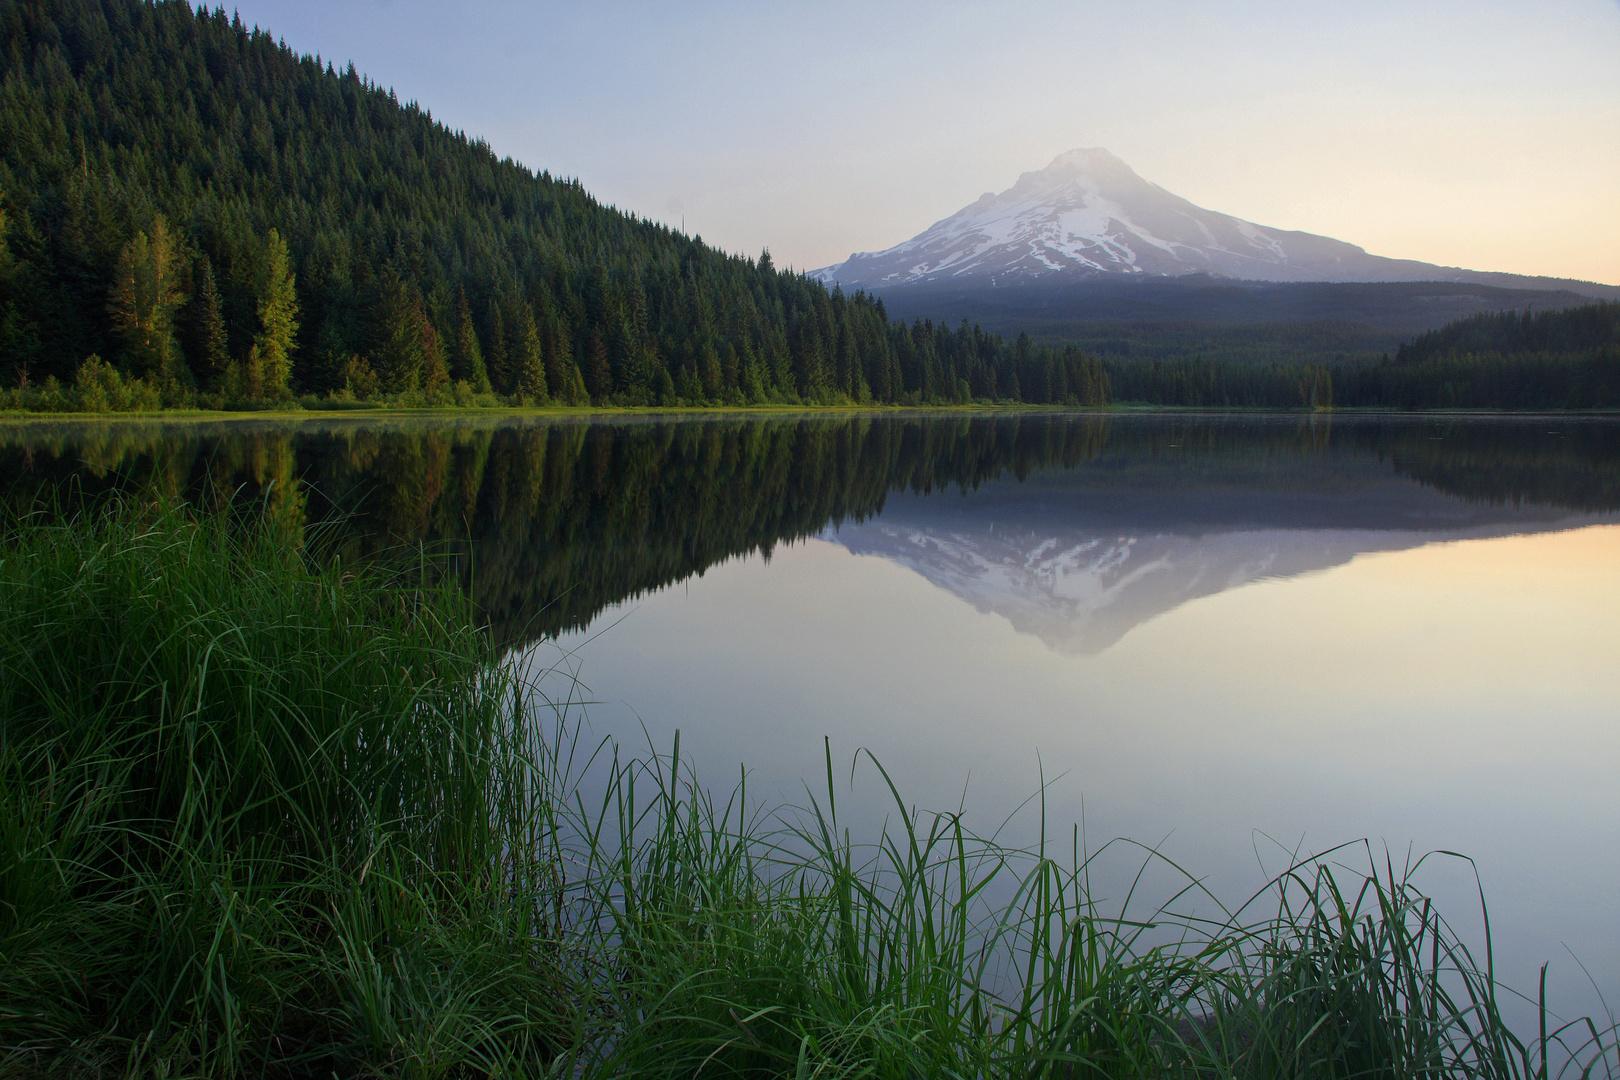 Mt. Hood and Trillium Lake, Oregon